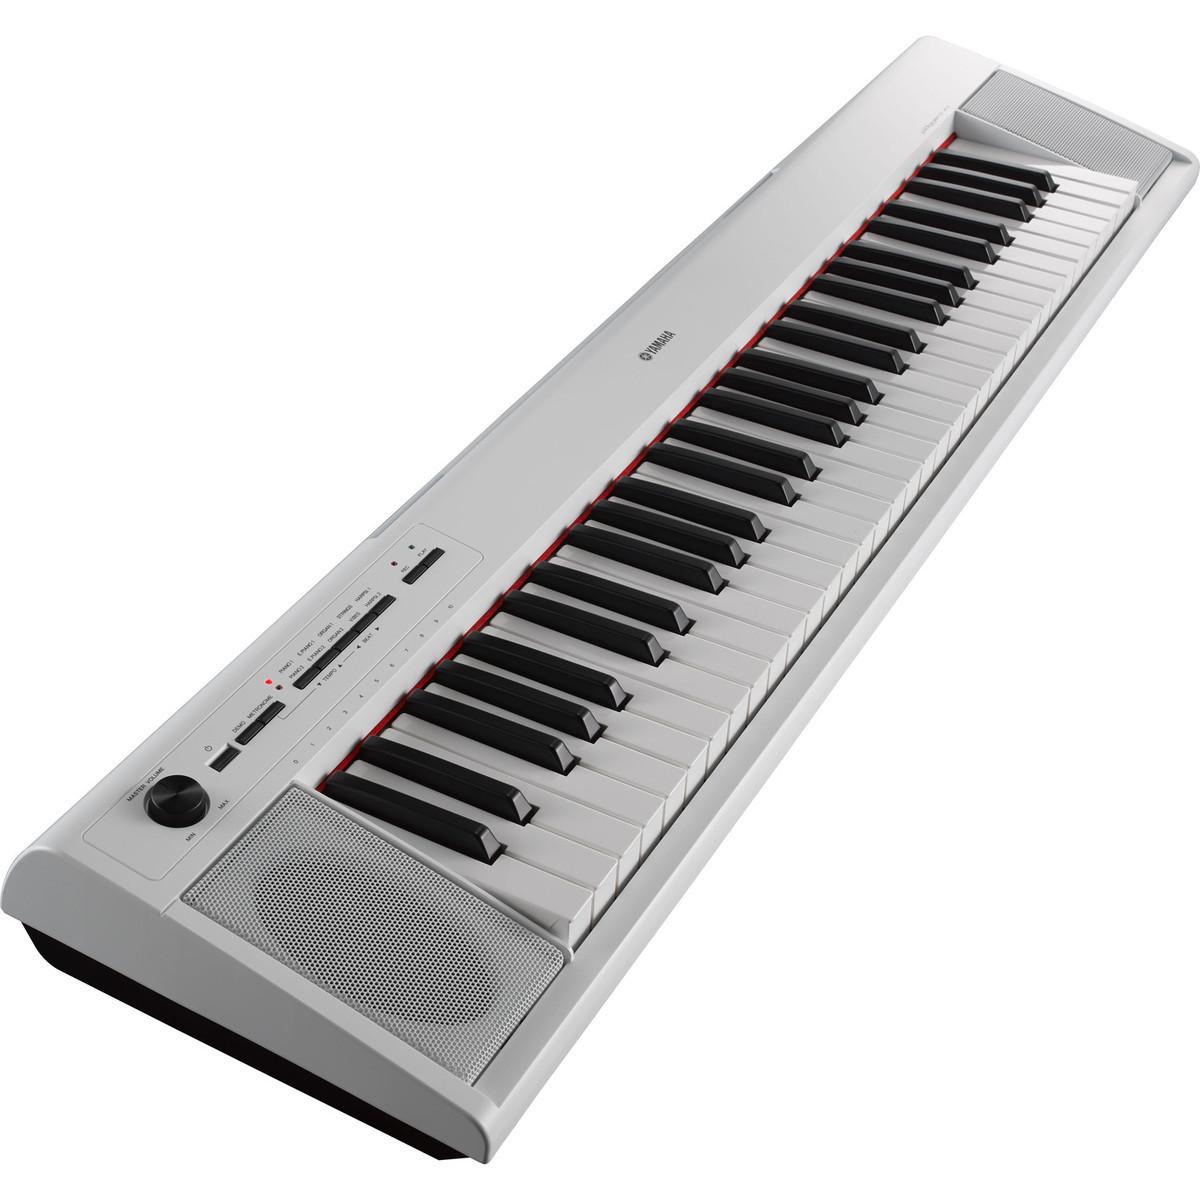 Yamaha Piaggero Np12 : yamaha piaggero np12 portable digital piano white inc accessories at gear4music ~ Vivirlamusica.com Haus und Dekorationen